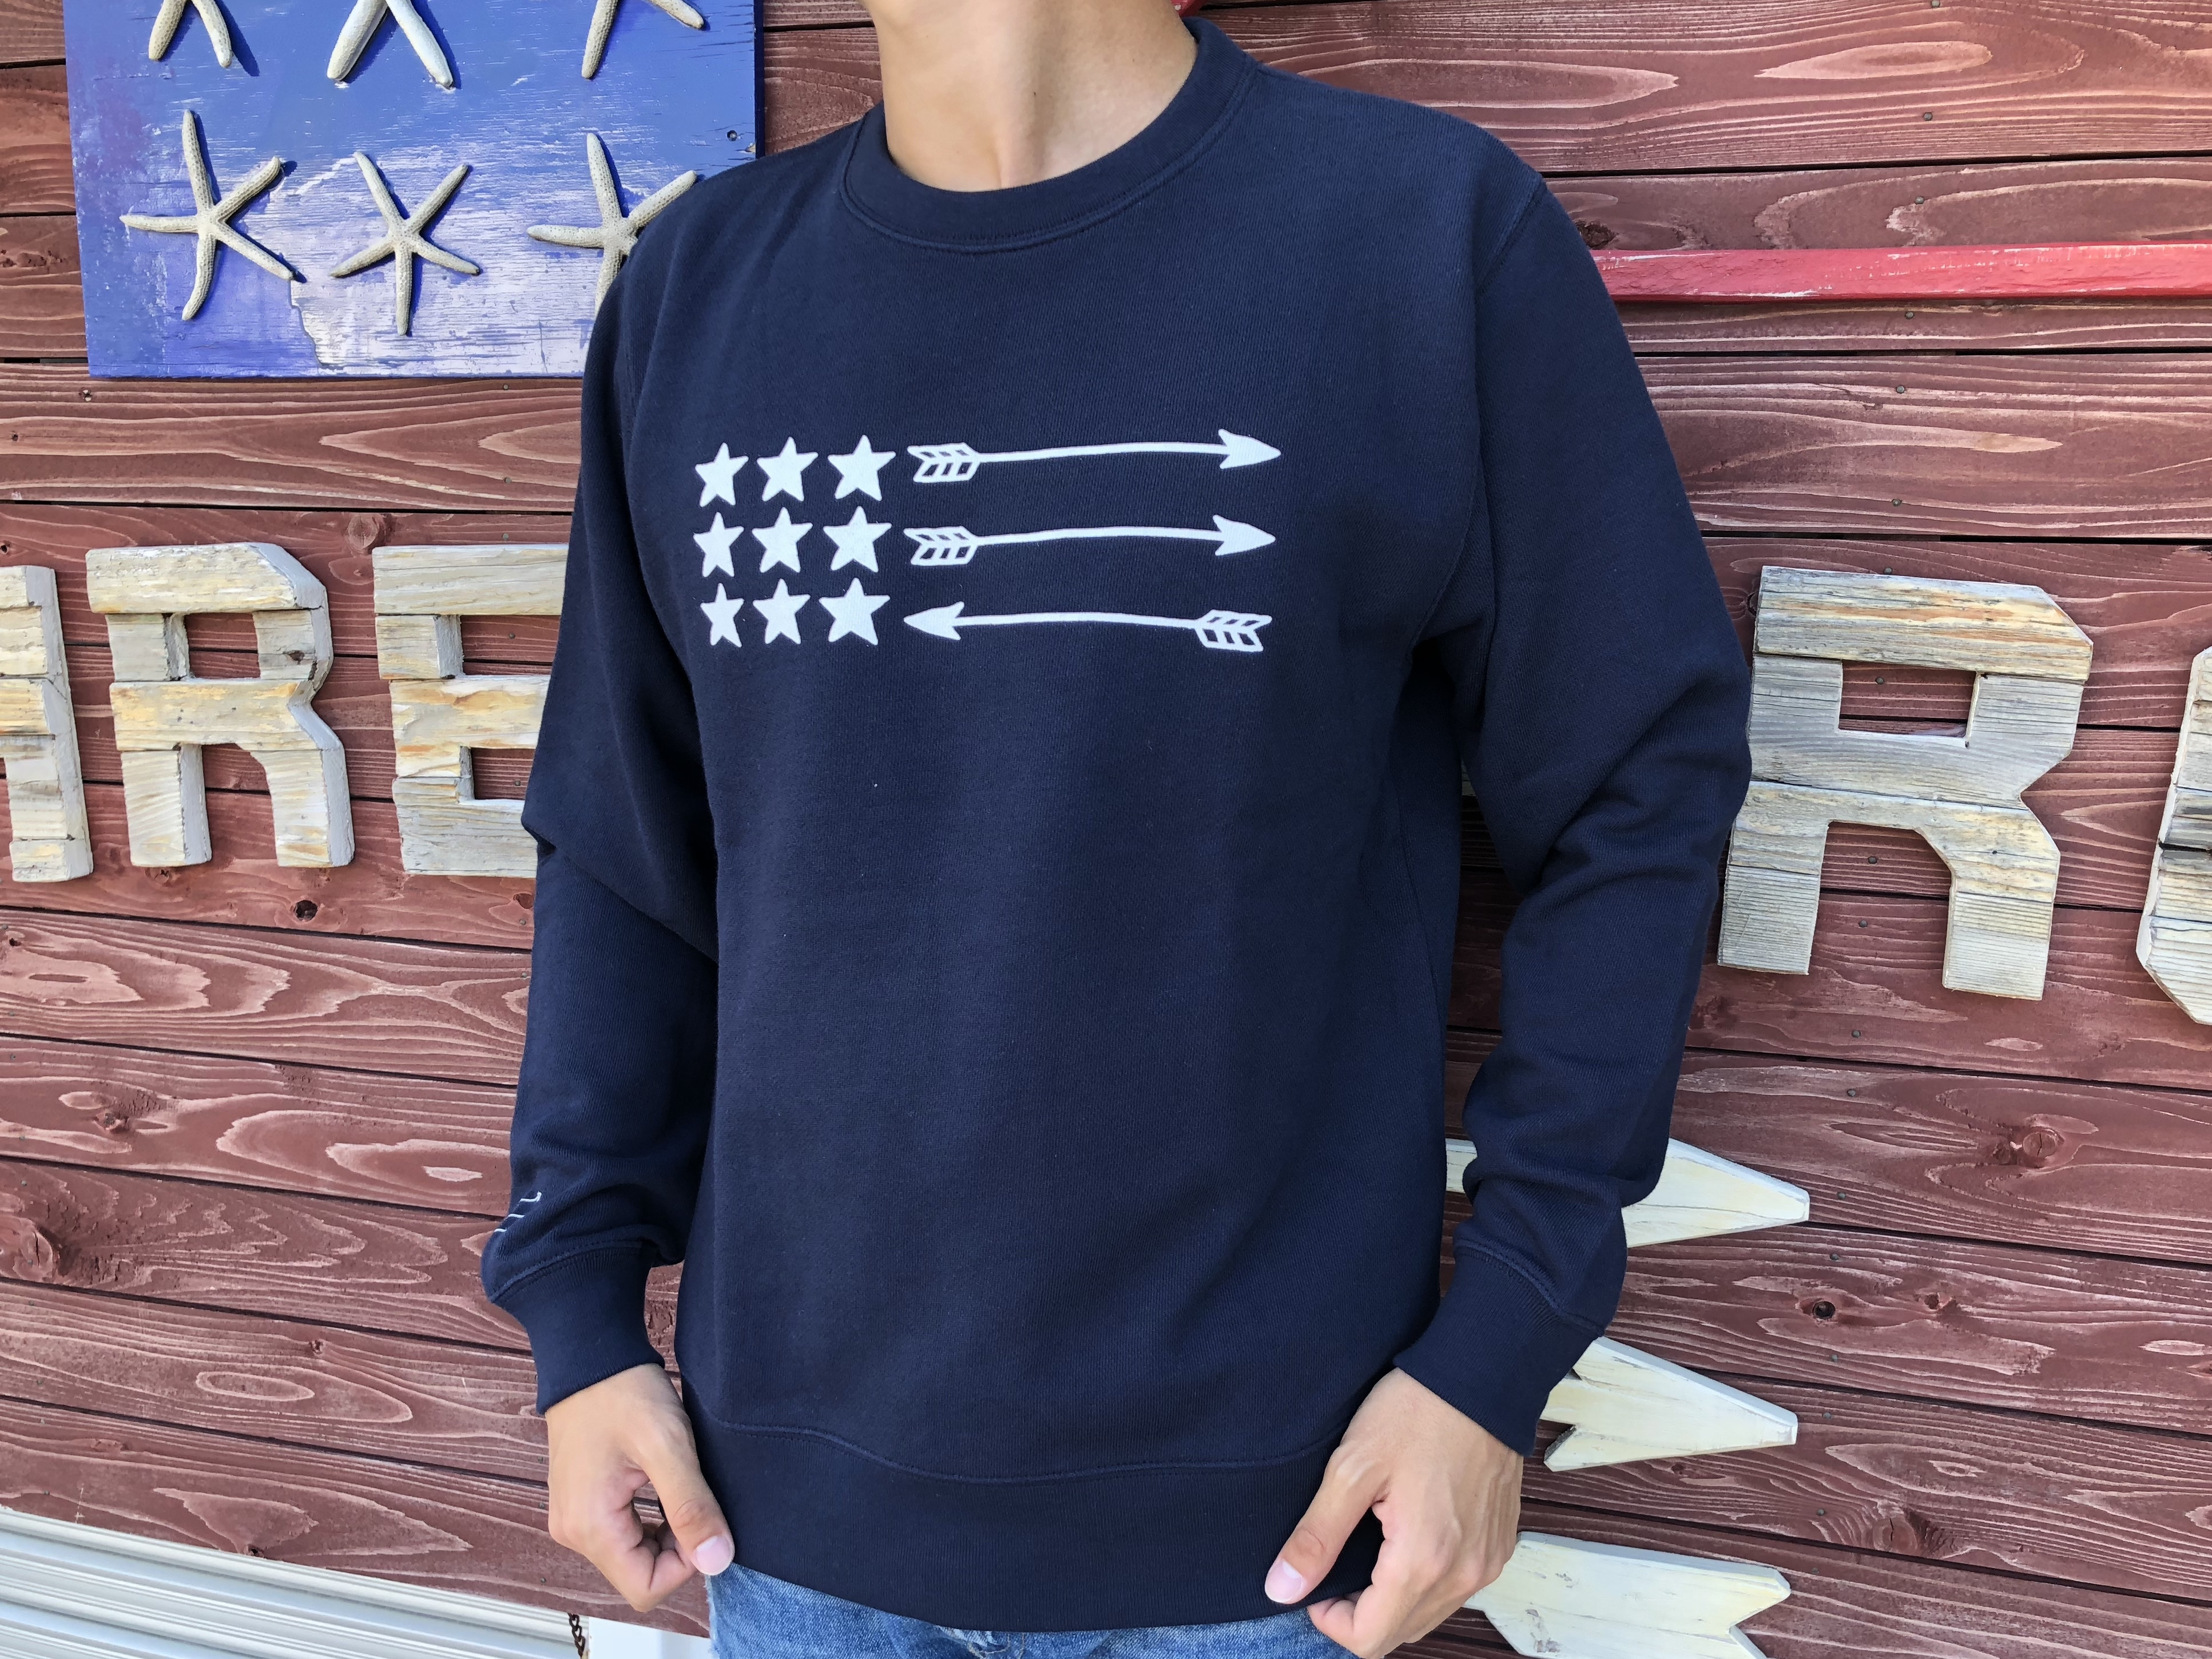 USA ArrowFlag スウェット(navy)